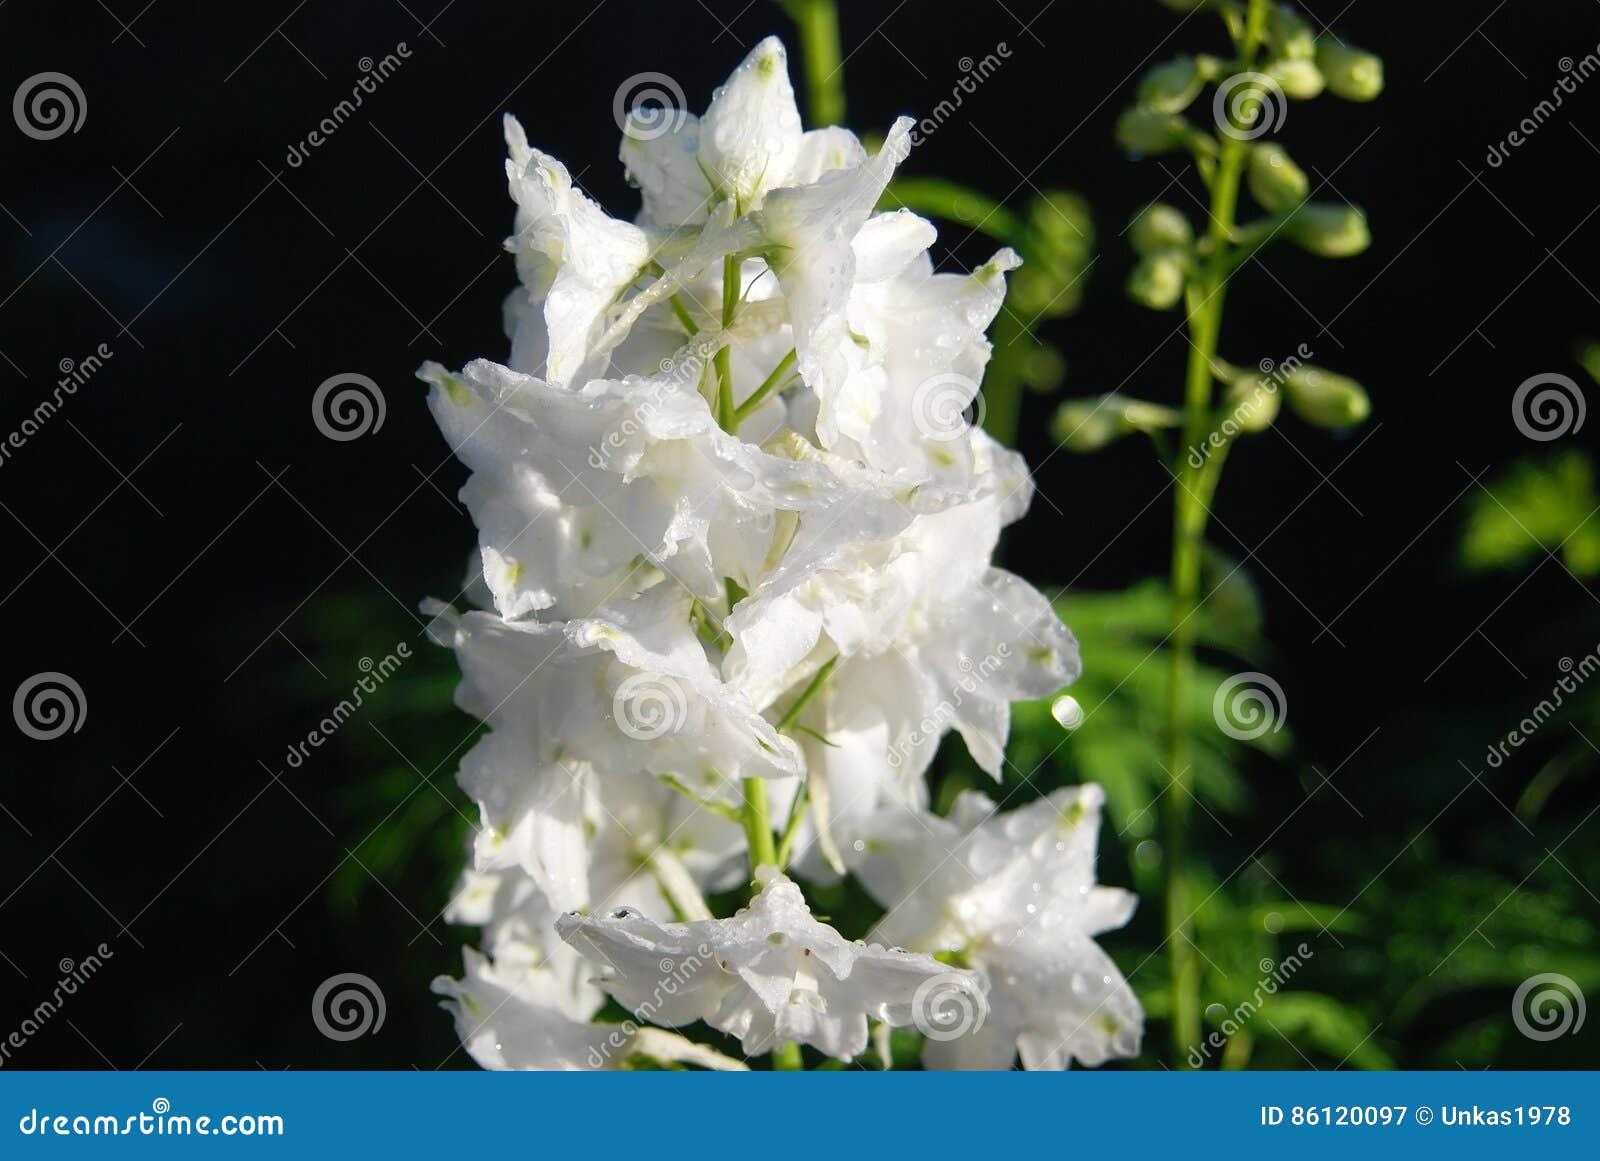 Beautiful Delphinium Flower Stock Image Image Of Flower